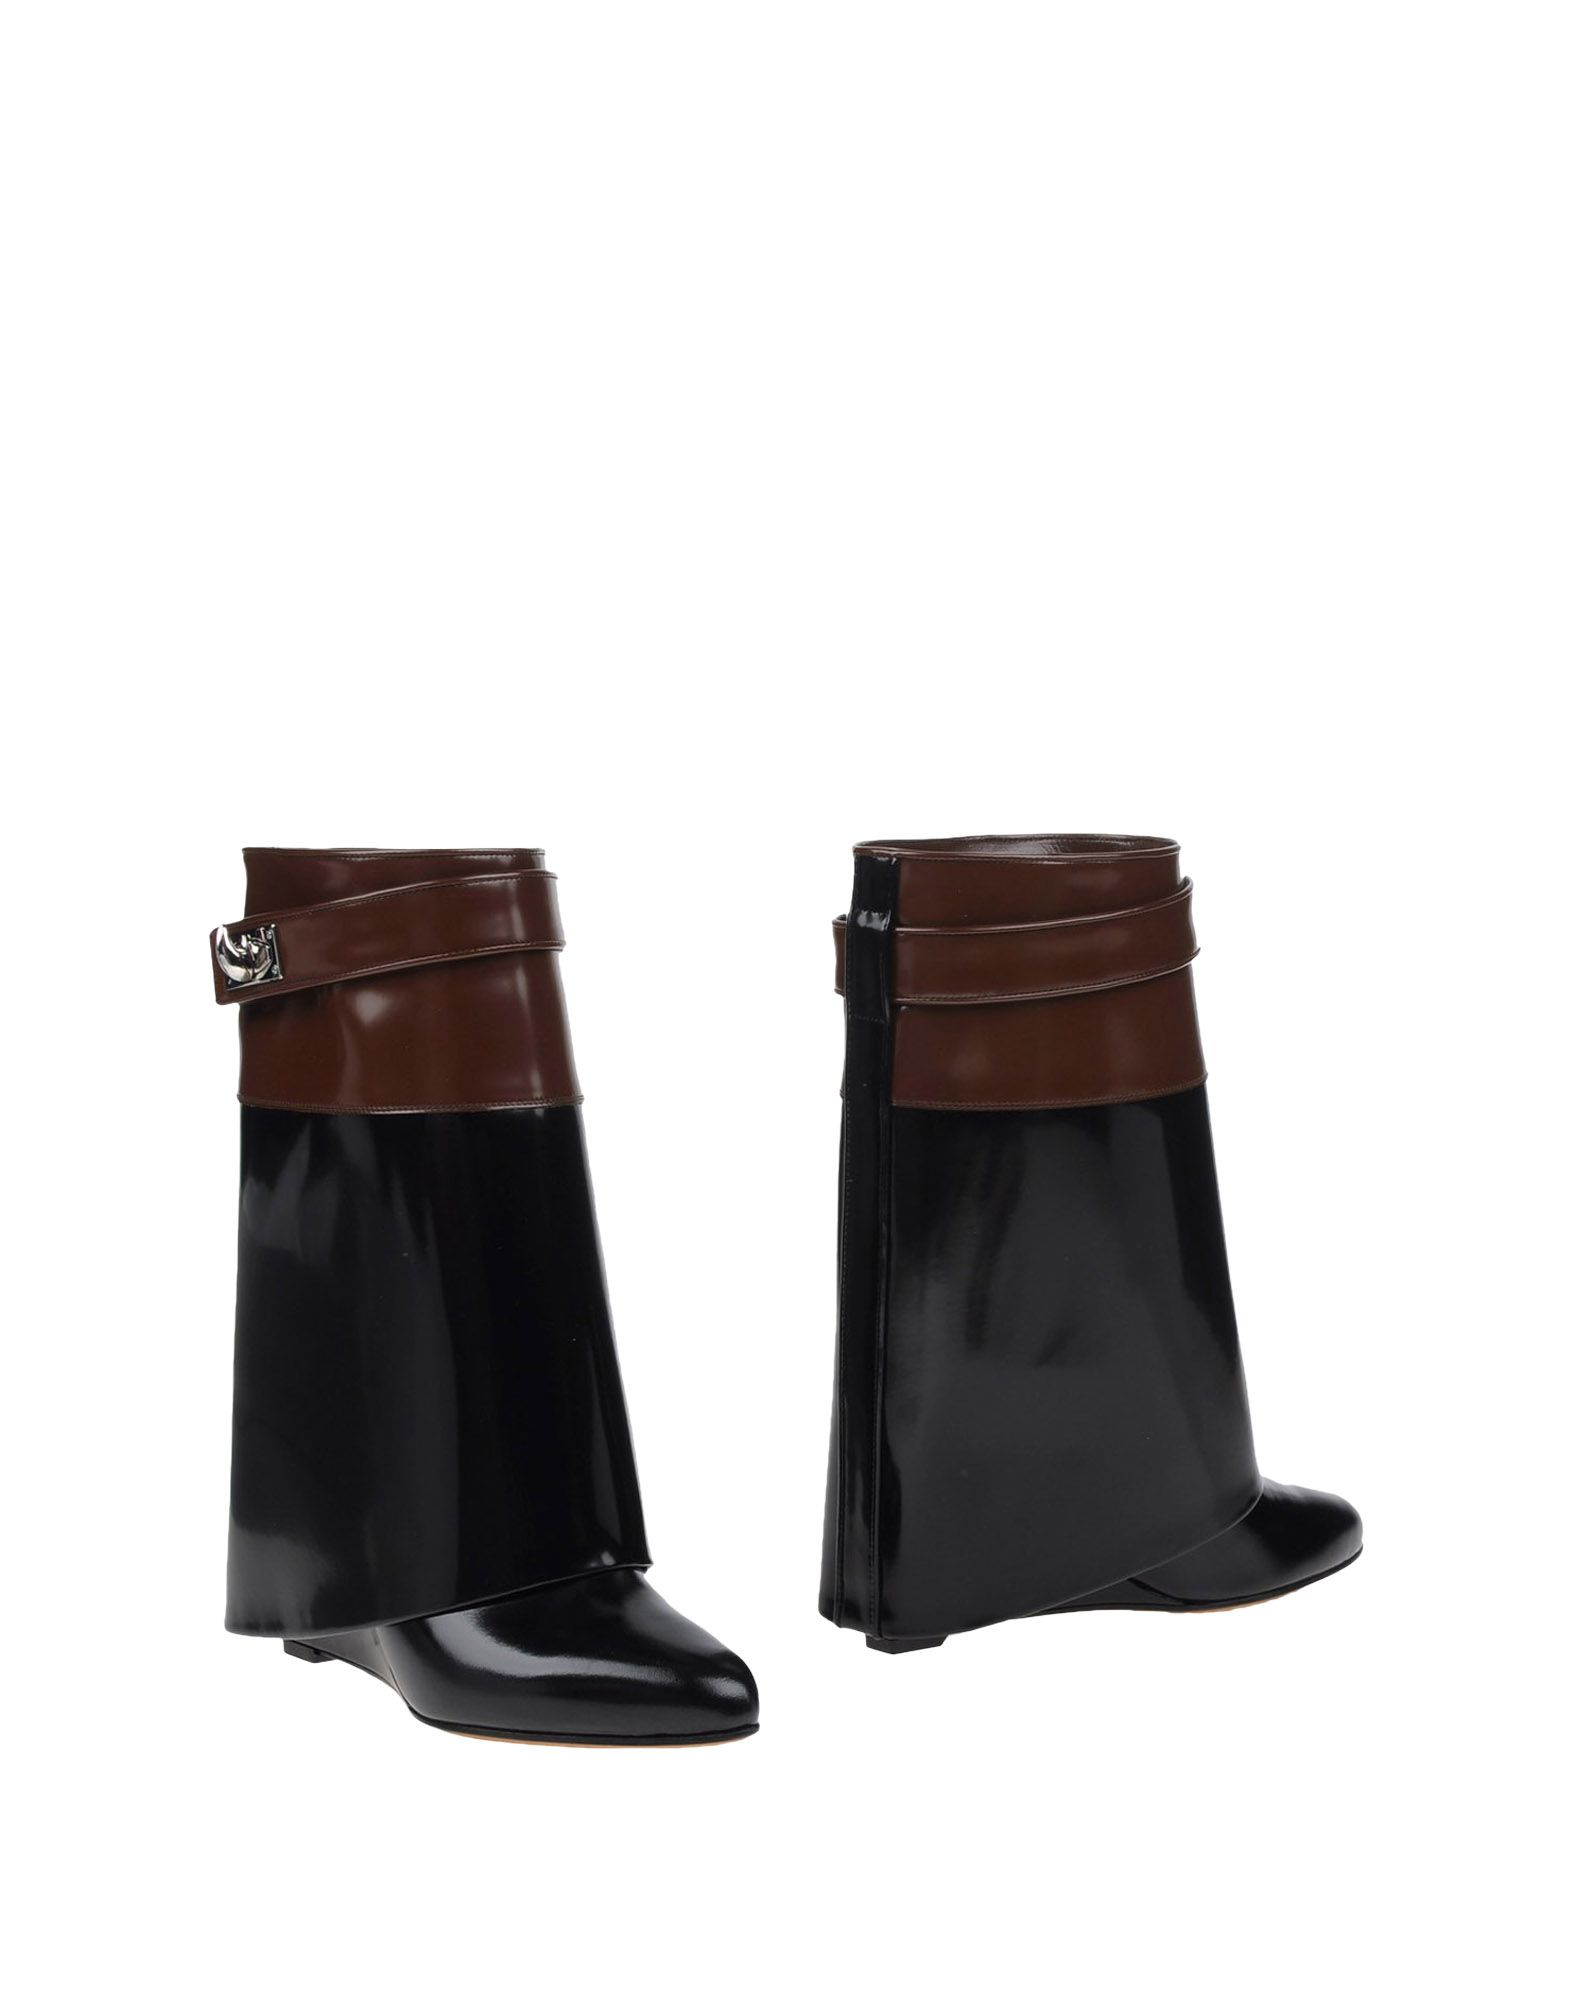 A buon mercato Stivaletti Givenchy Donna - 44937635OR